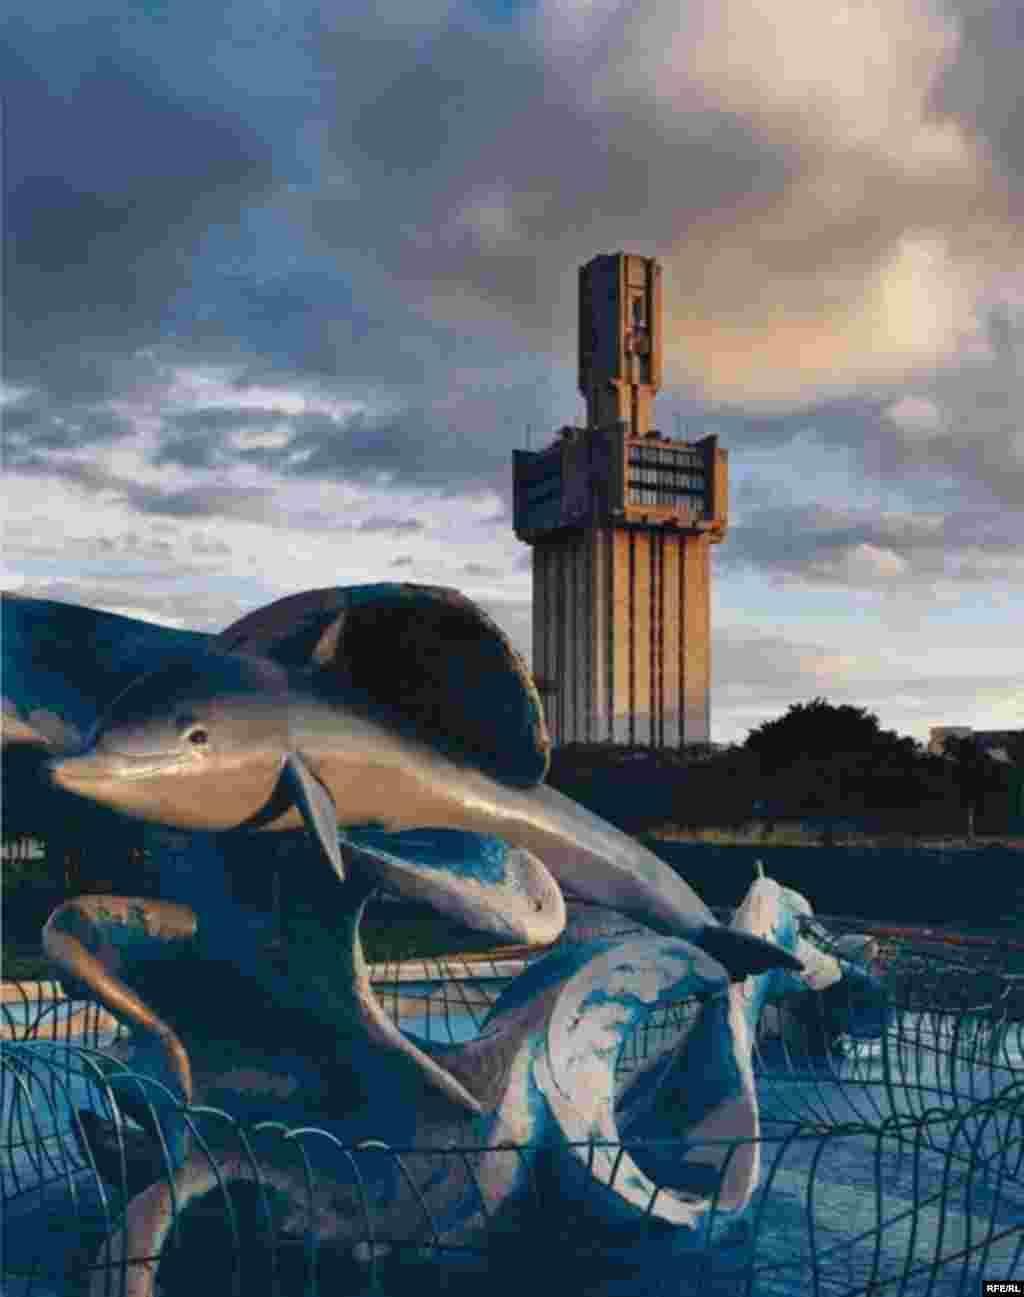 Cosmic Communist Constructions #10